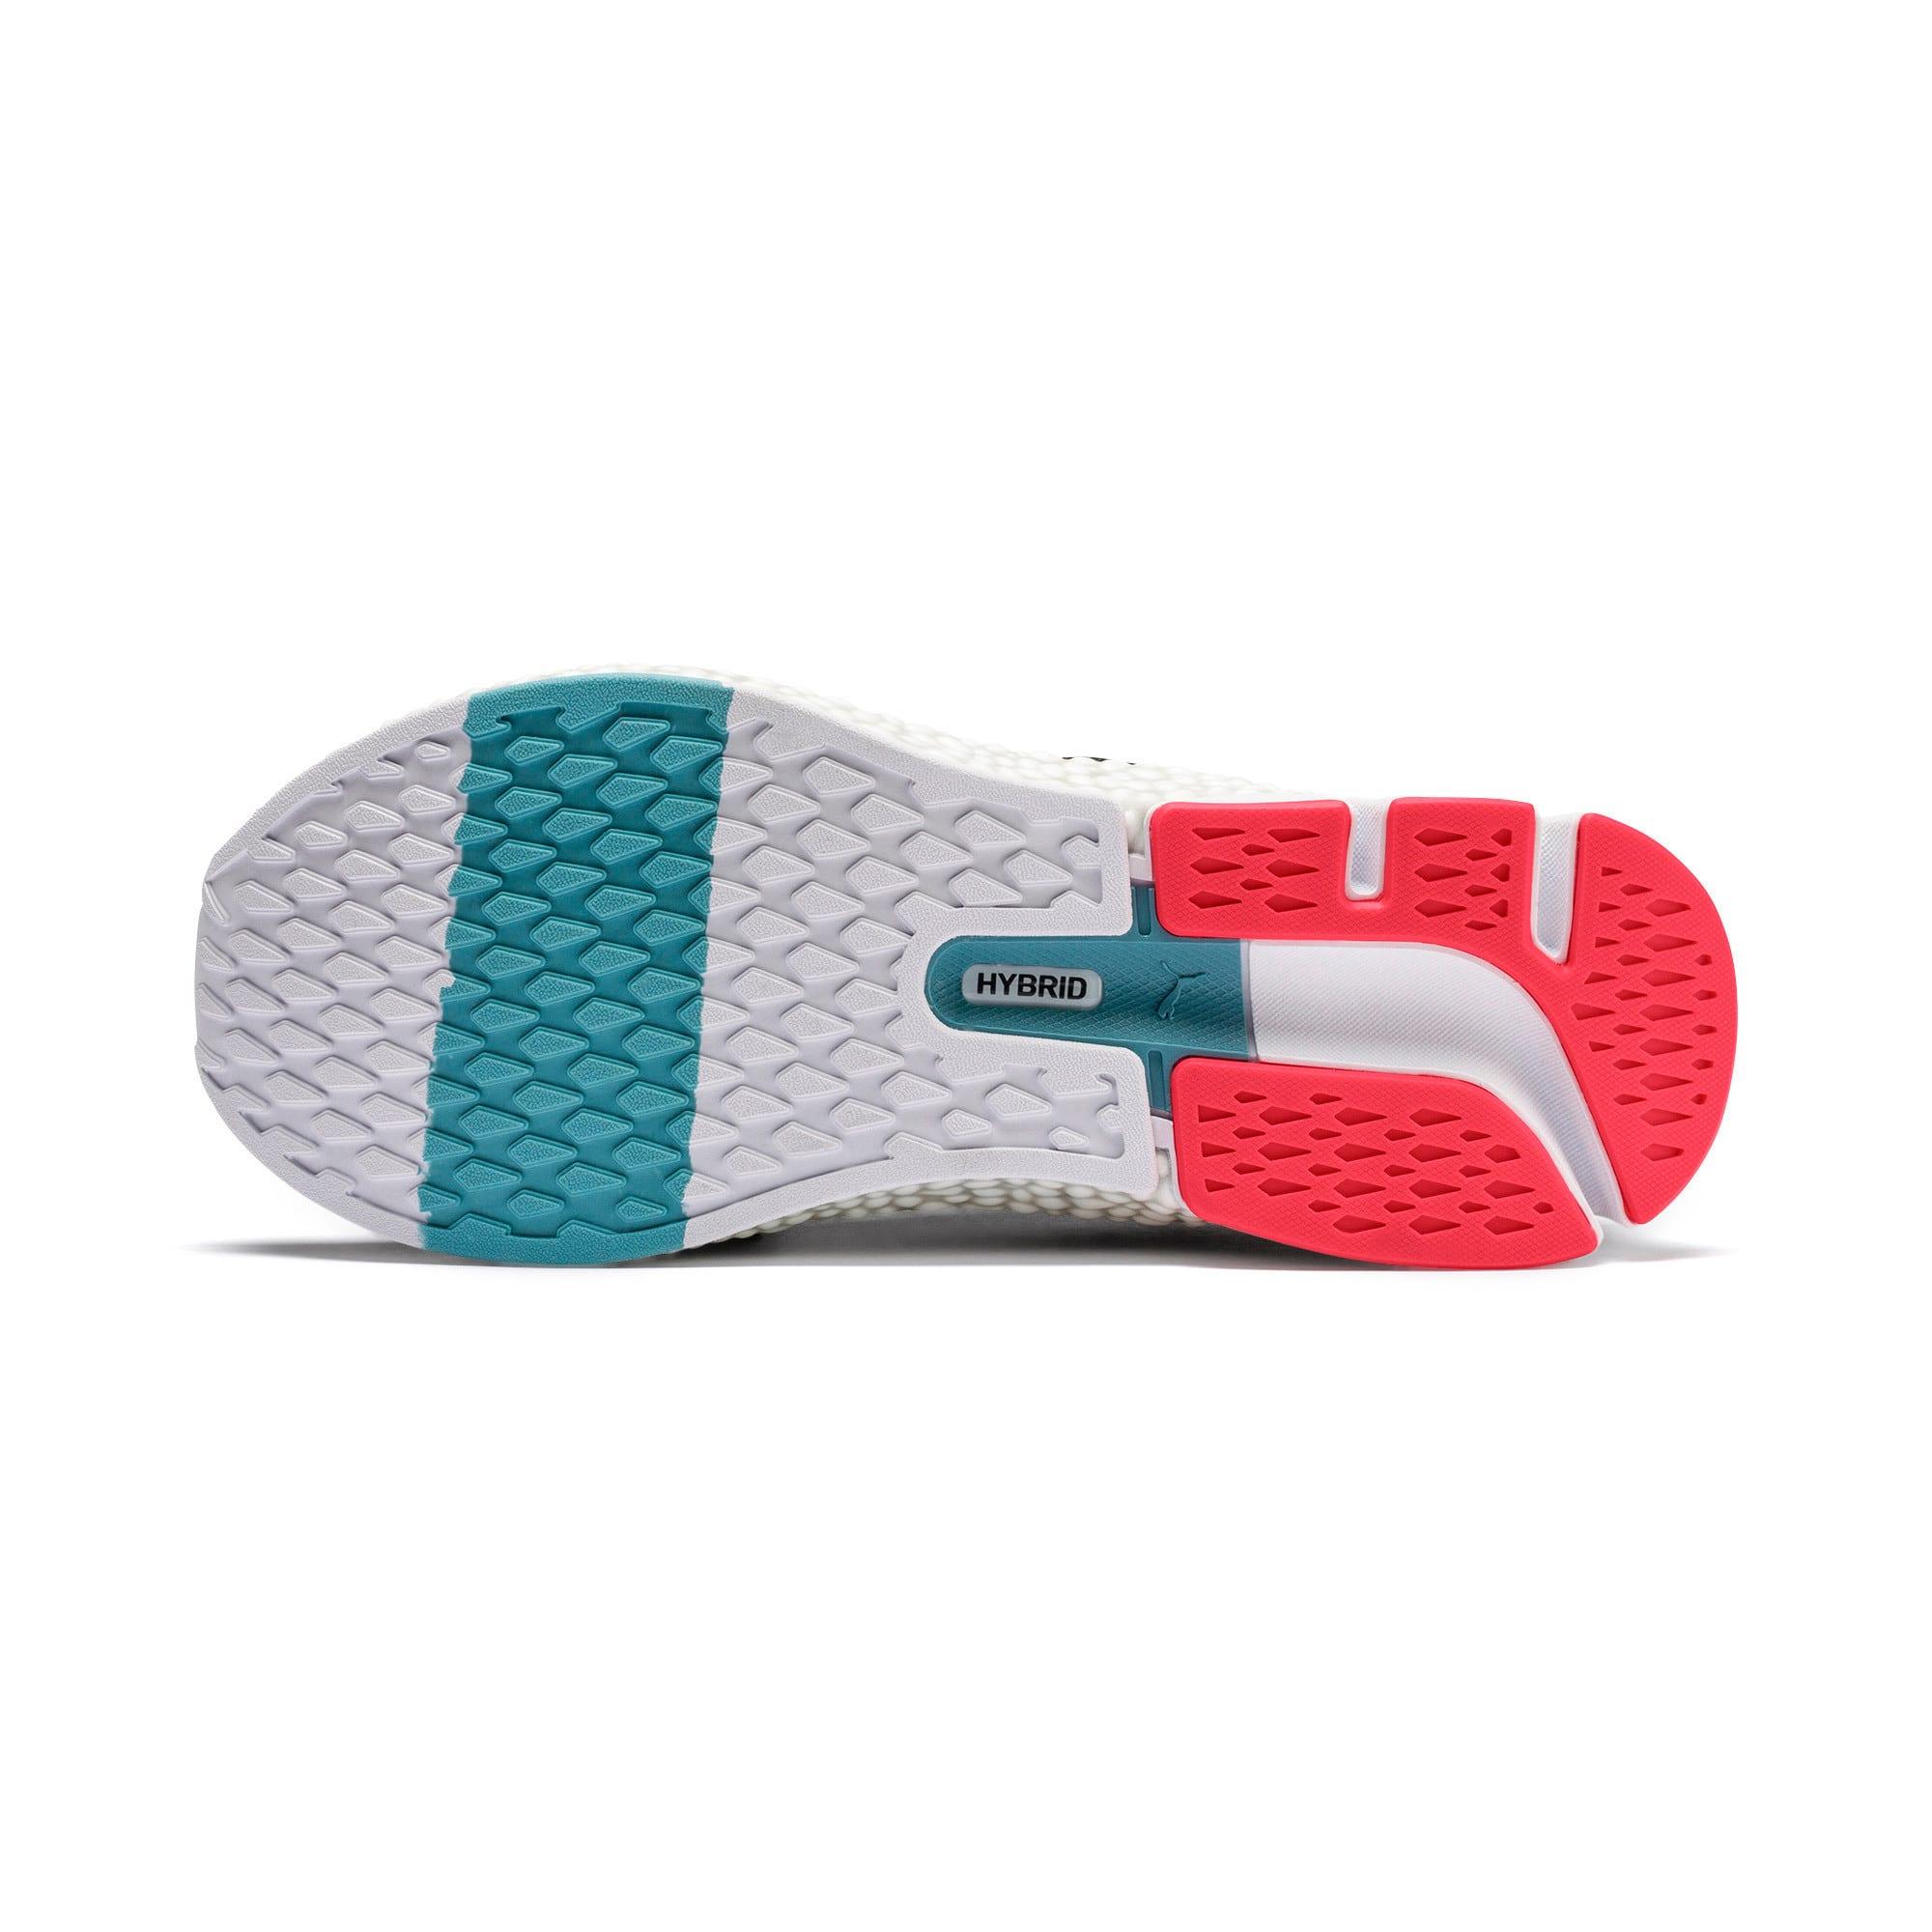 Thumbnail 8 of HYBRID NETFIT Astro Women's Running Shoes, Puma Black-Pink Alert, medium-IND